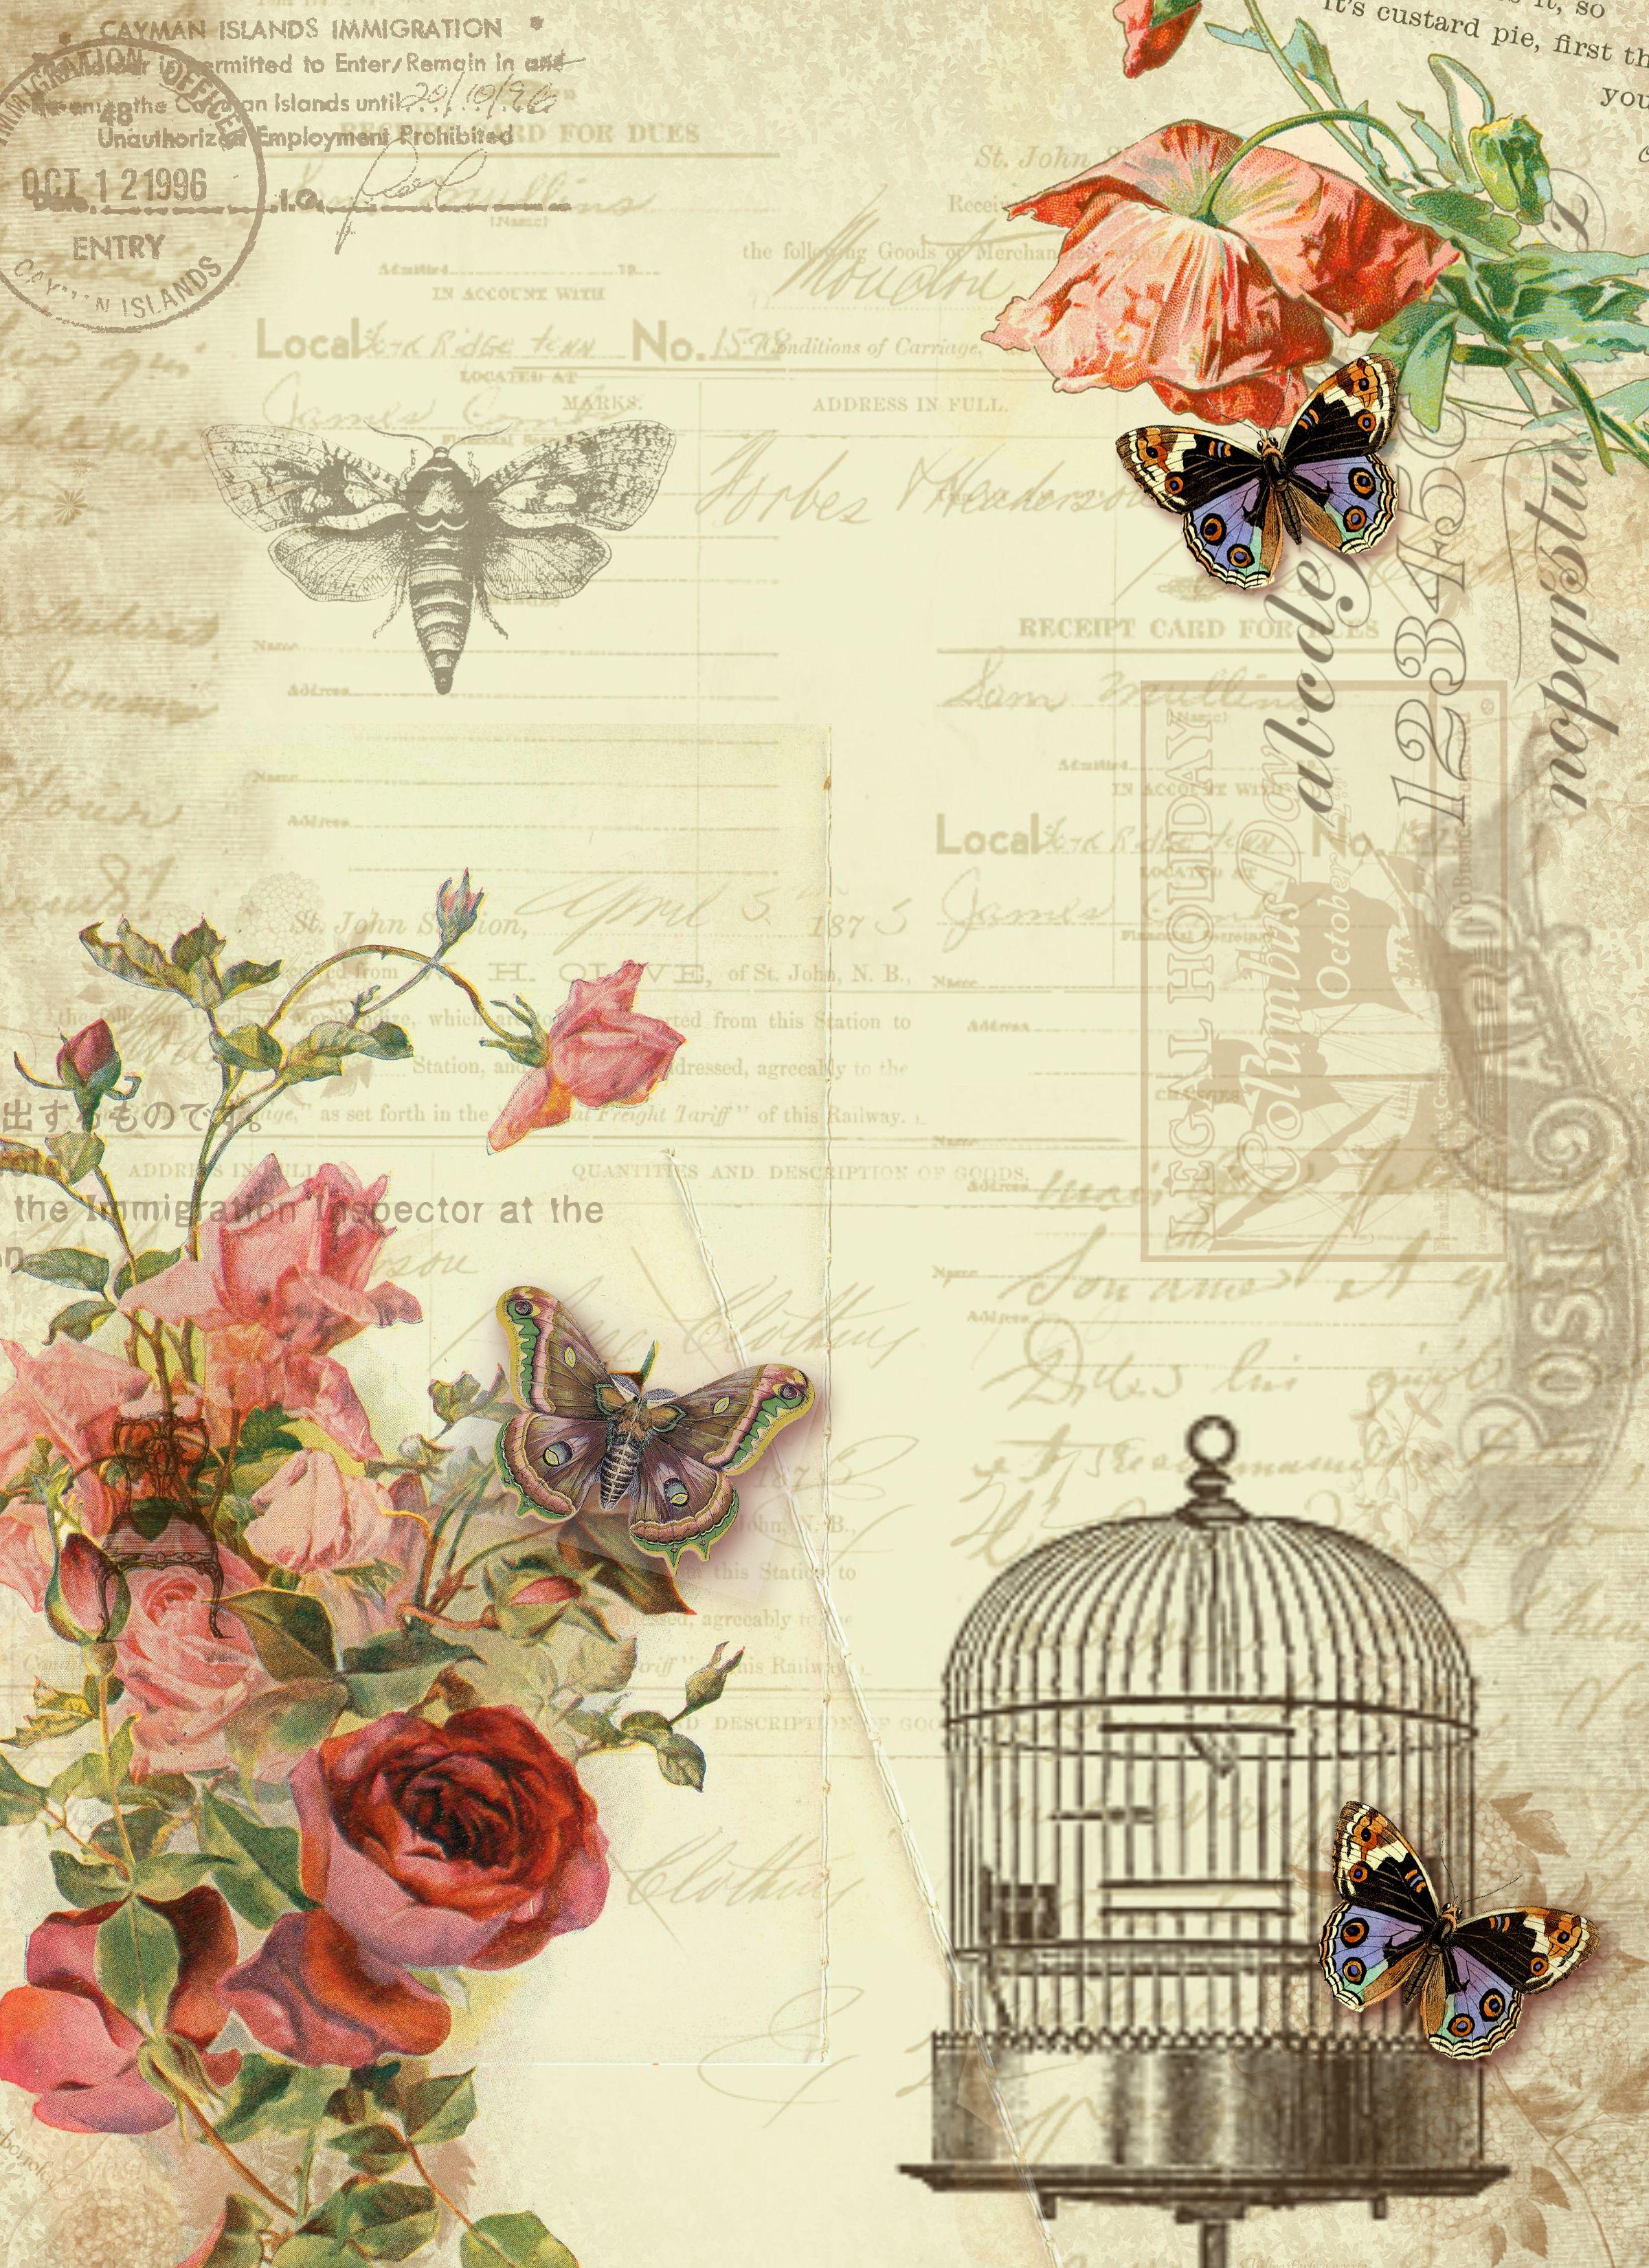 Tutte Le Dimensioni Butterfly And Rose Paper Flickr Condivisione Di Foto Vintage Printables Vintage Paper Vintage Images